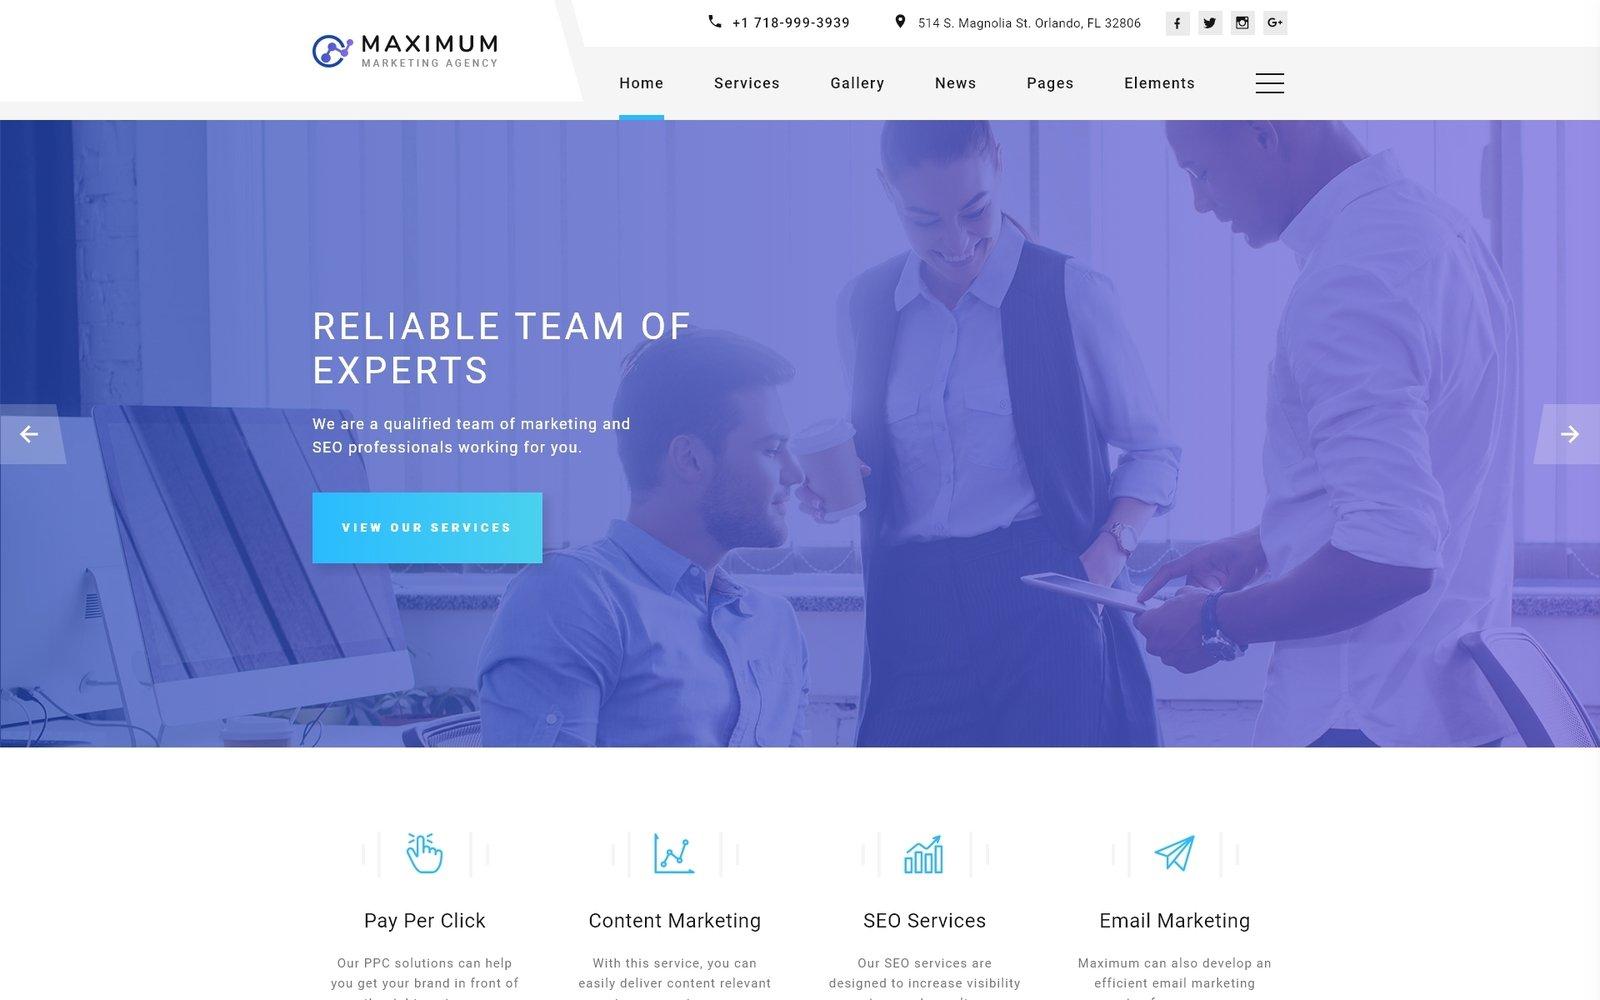 Maximum - Efficient Digital Agency Multipage HTML Website Template - screenshot